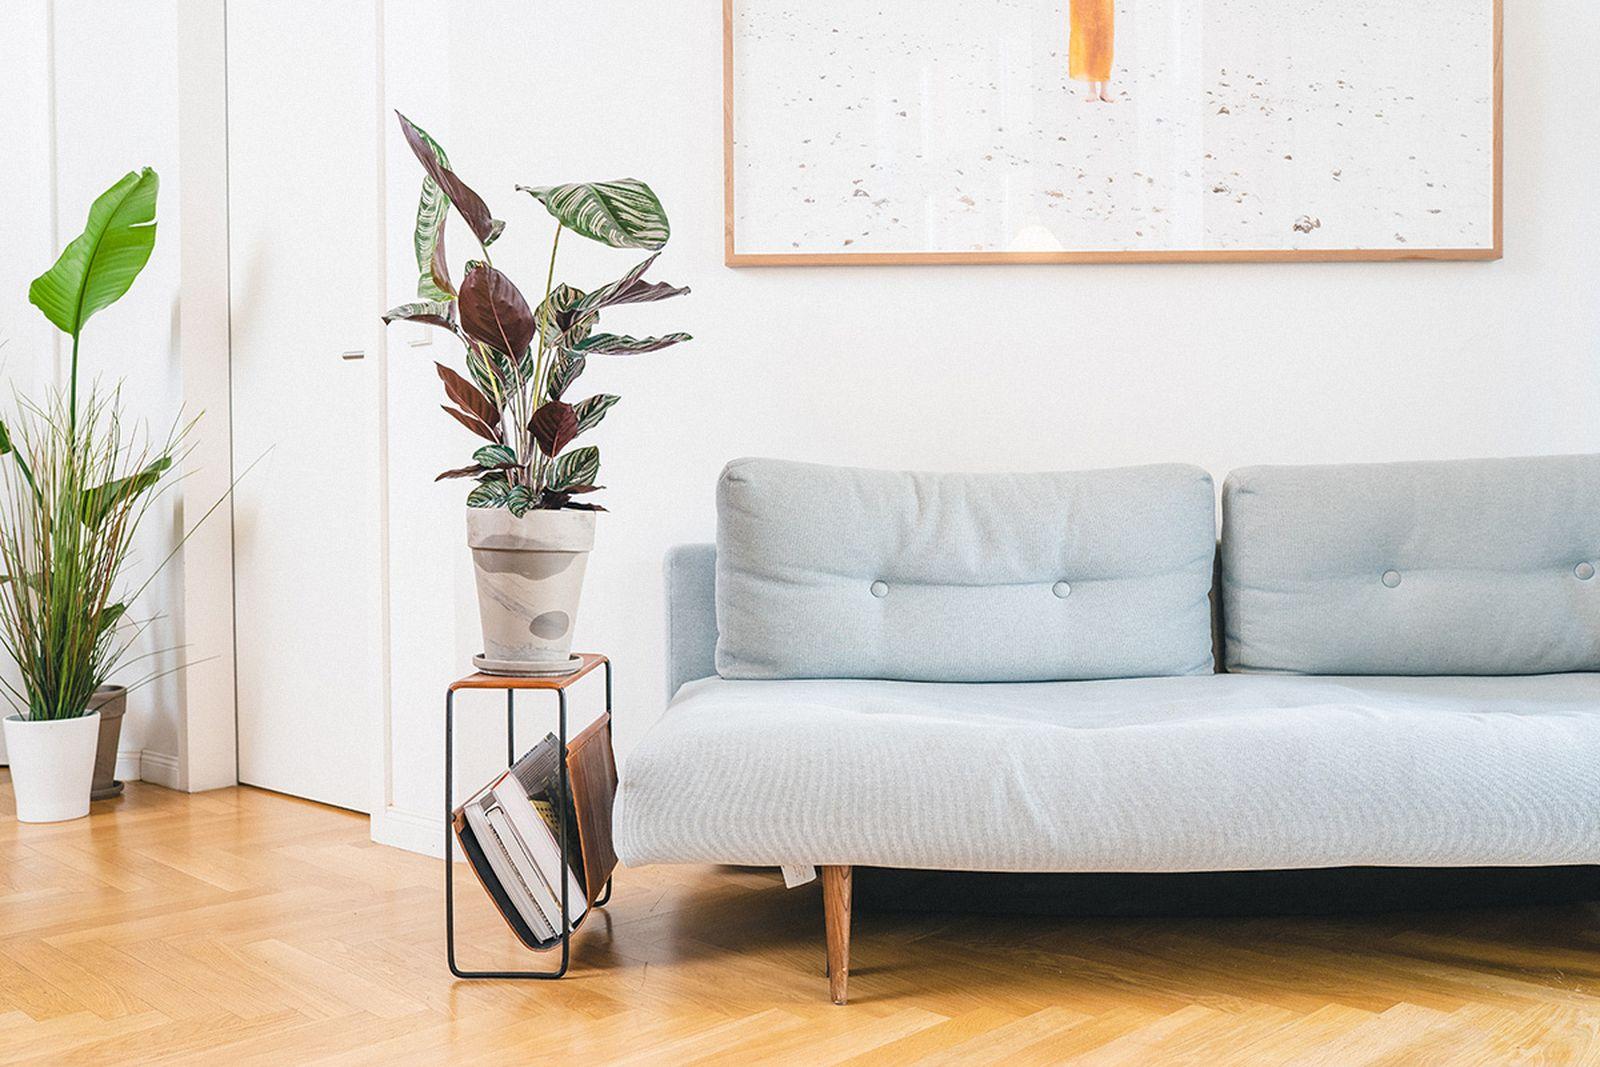 easy-house-plants-for-beginners-09